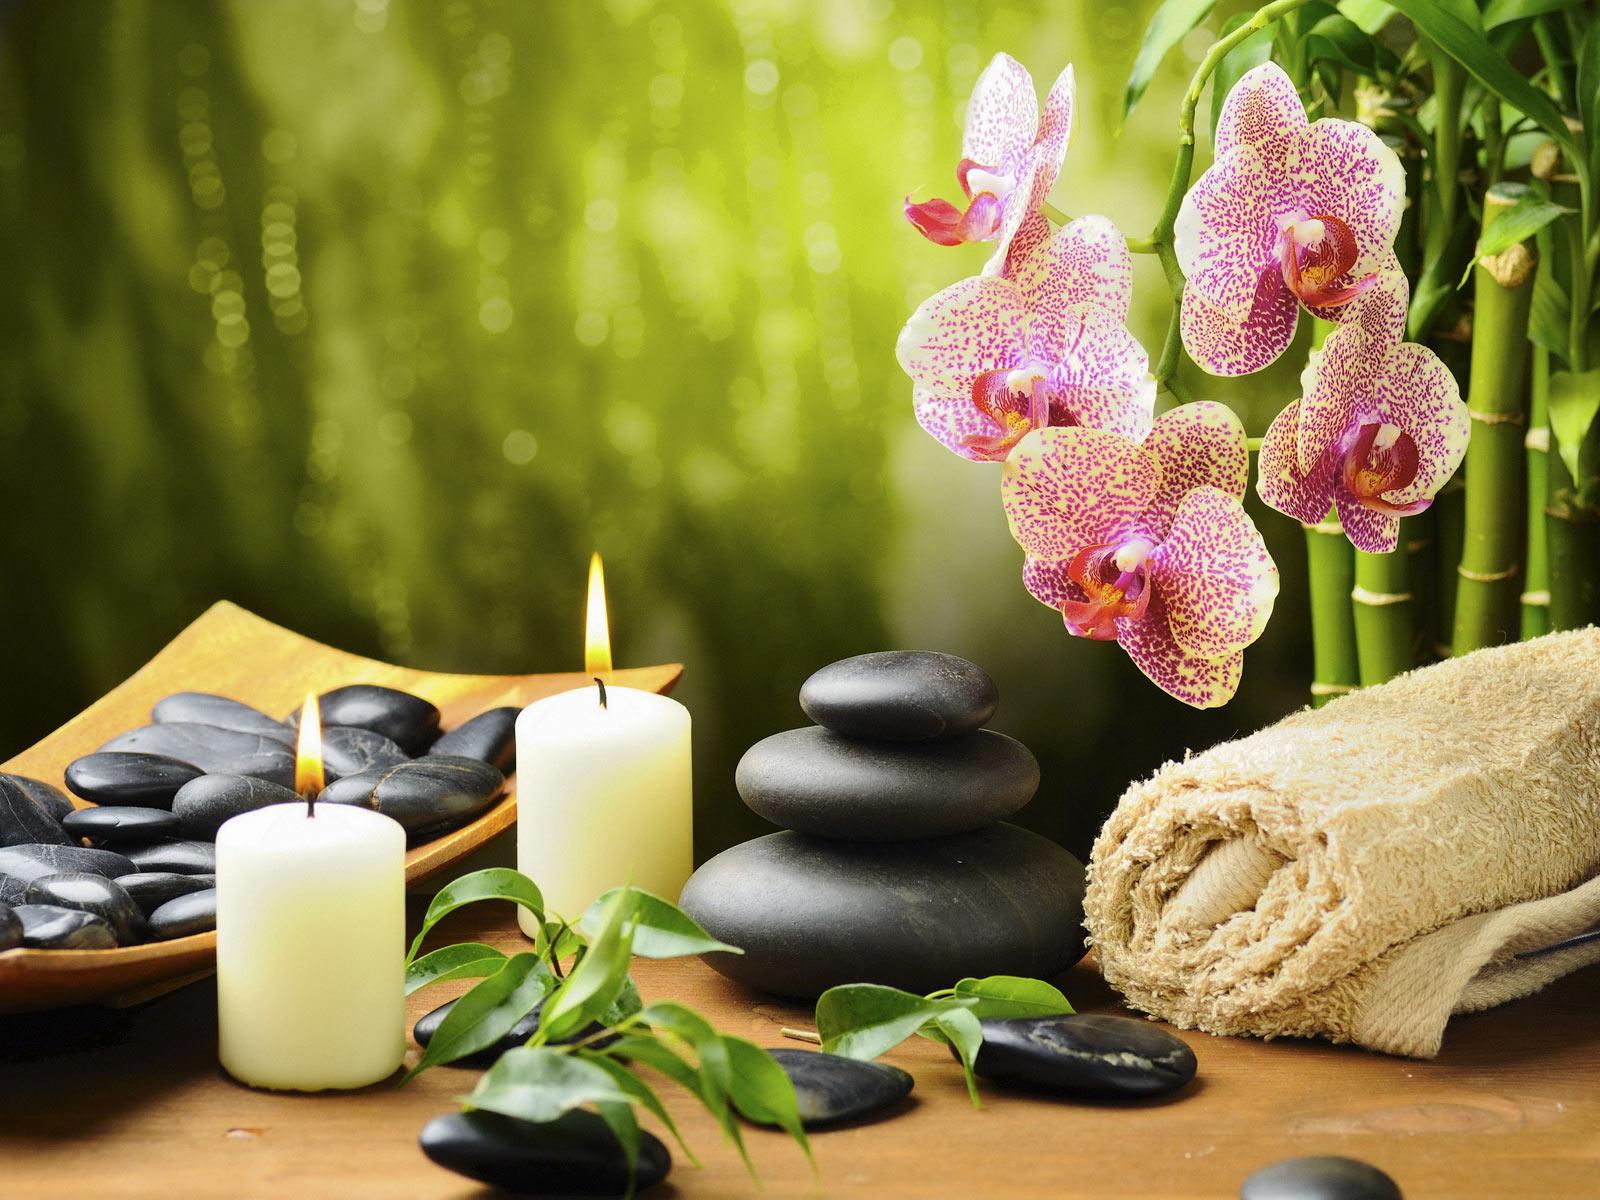 nätdejting gratis relax thaimassage